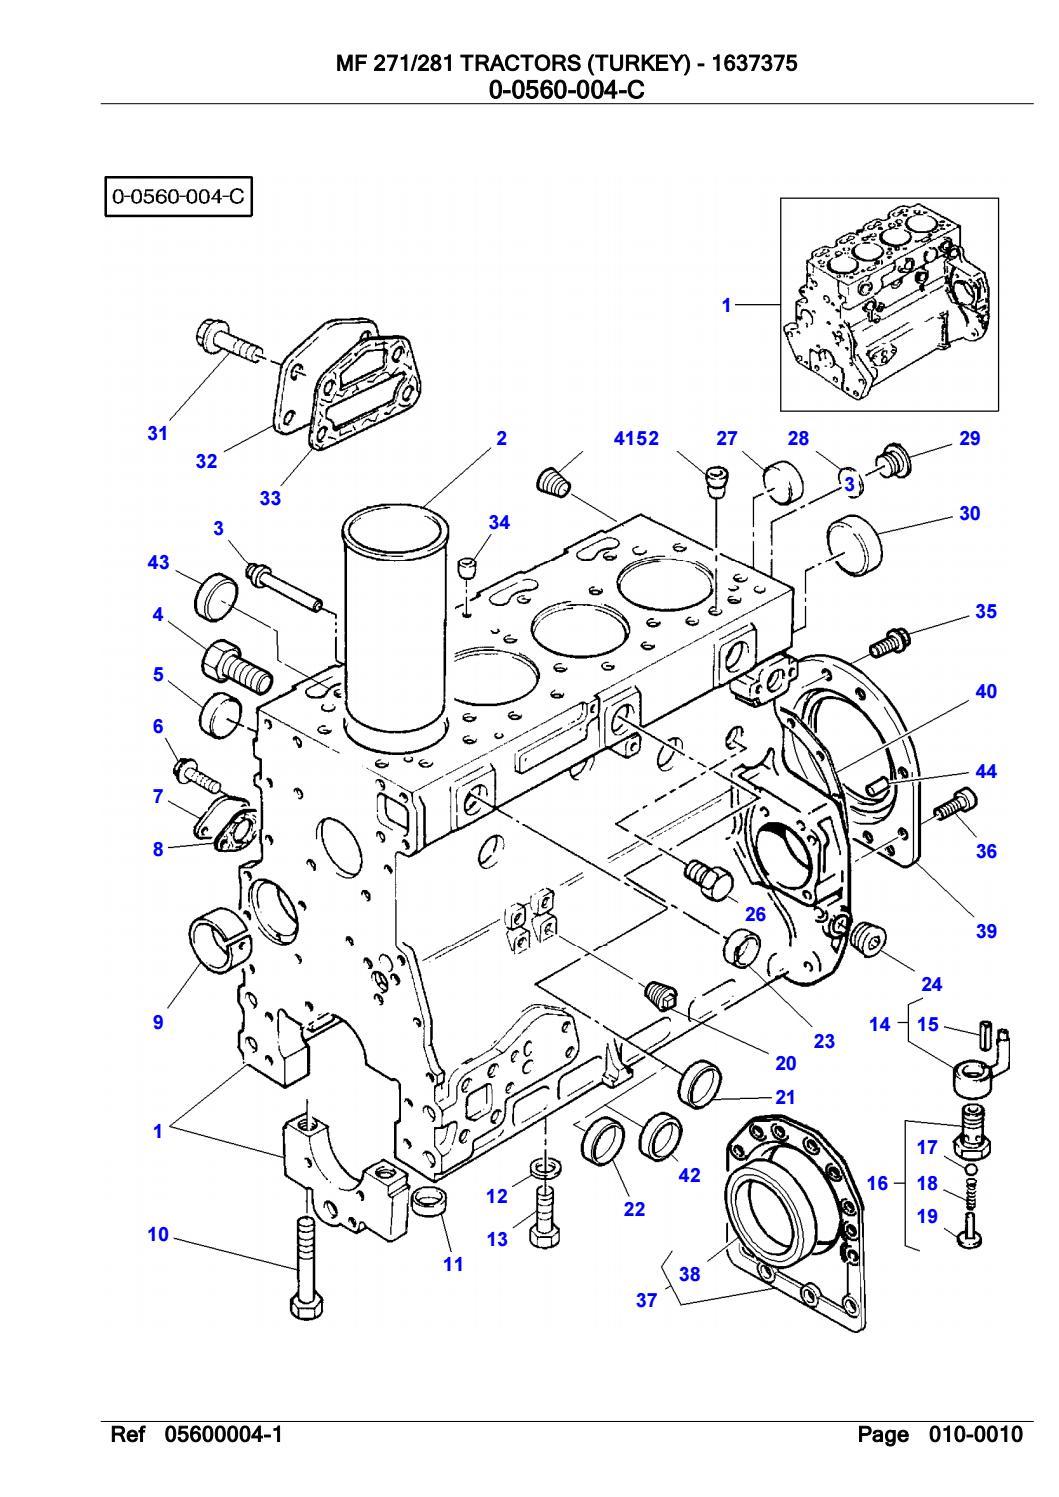 Massey Ferguson 271 TRACTOR (TURKEY) Service Parts